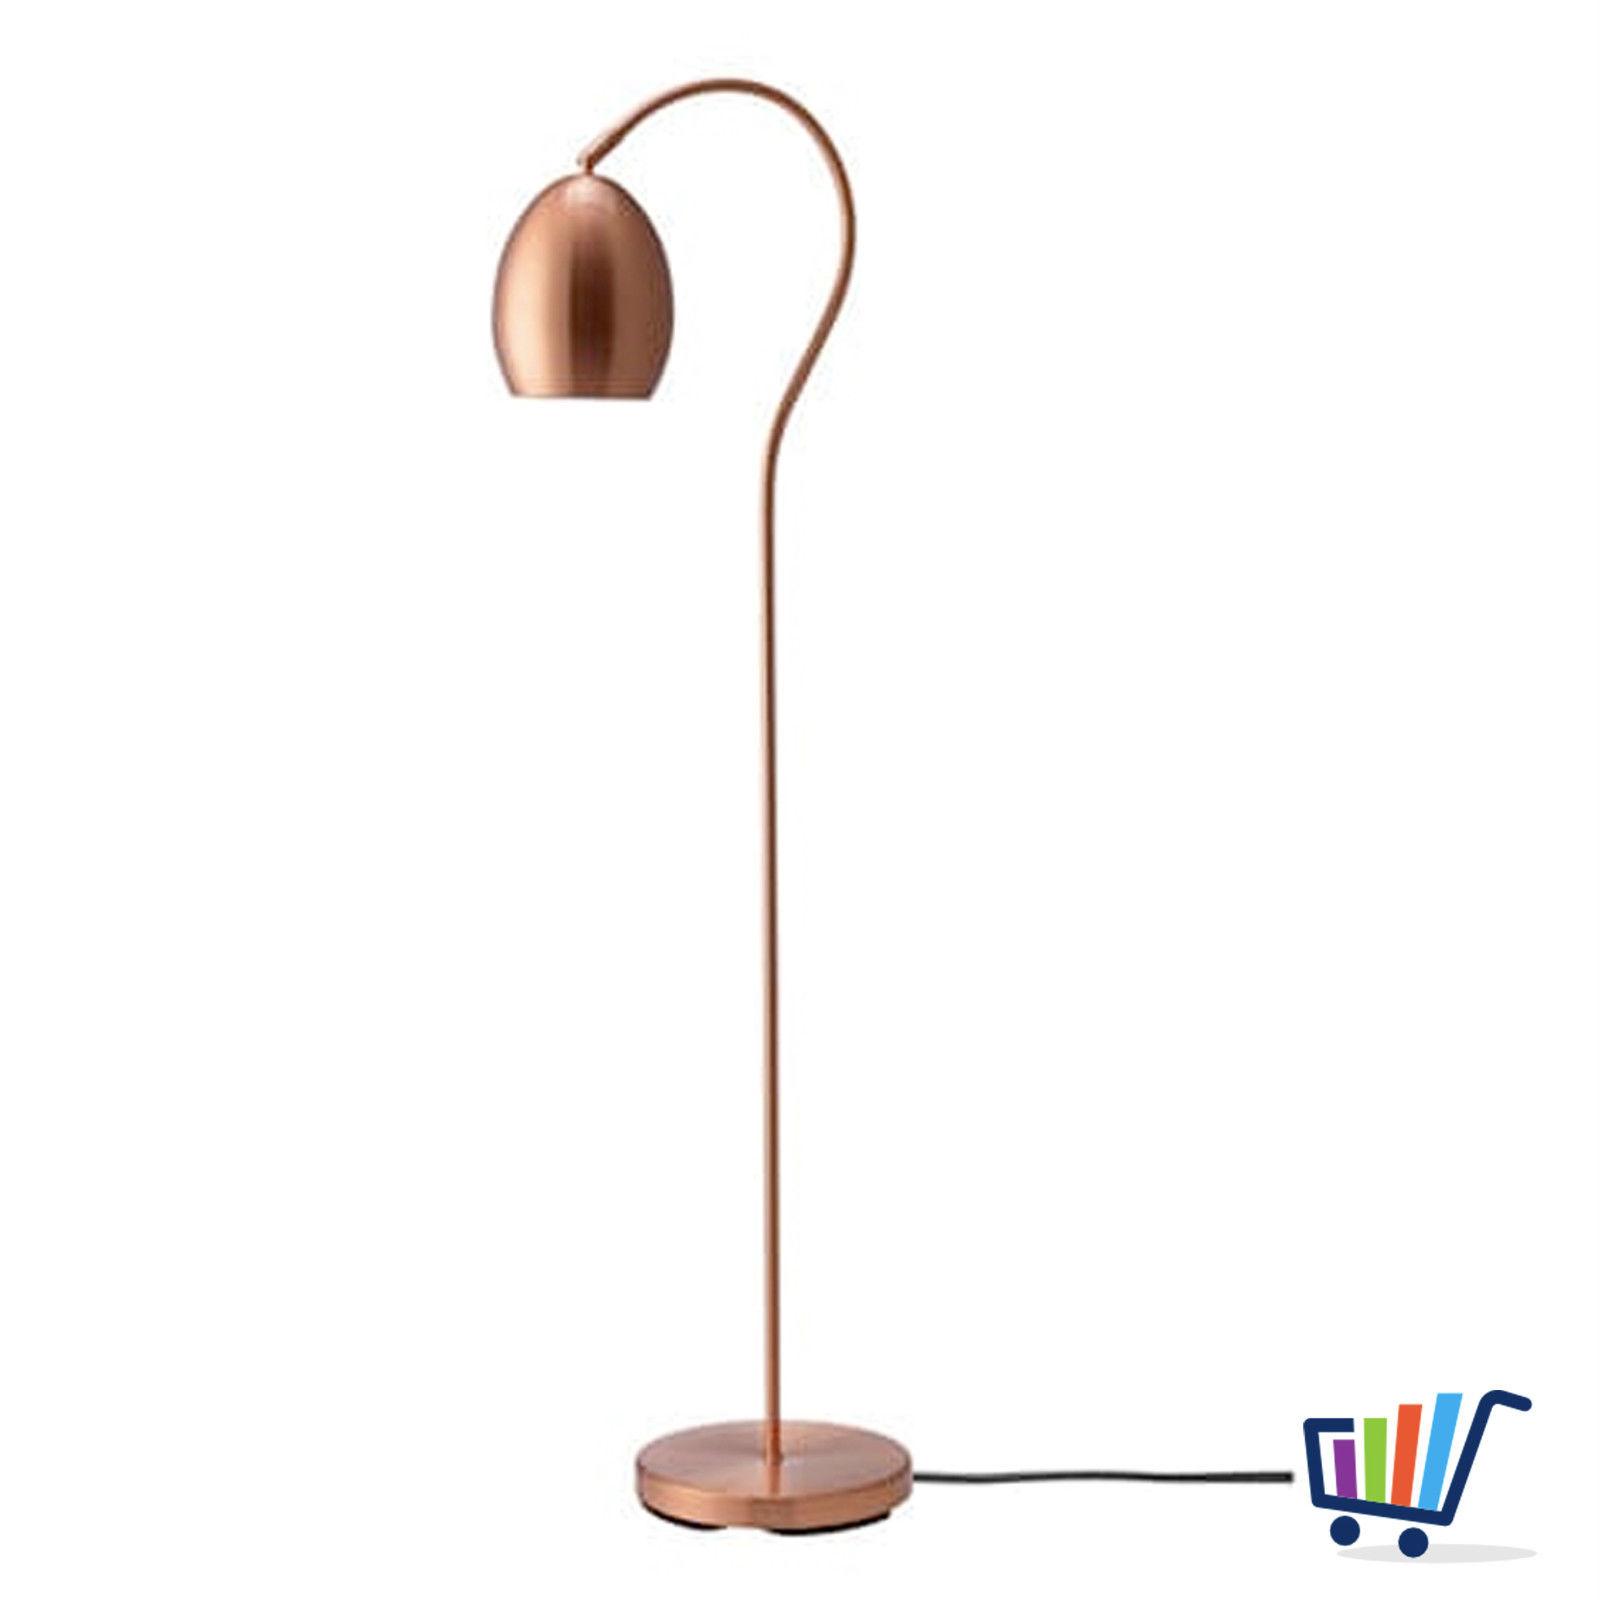 Full Size of Stehlampen Ikea Wien Lampe Stehlampe Moderne Lampen Papier Lampenschirm Led Schirm Dimmbar Sac7b47fb Saamvedmediacom Küche Kosten Miniküche Sofa Mit Wohnzimmer Stehlampen Ikea